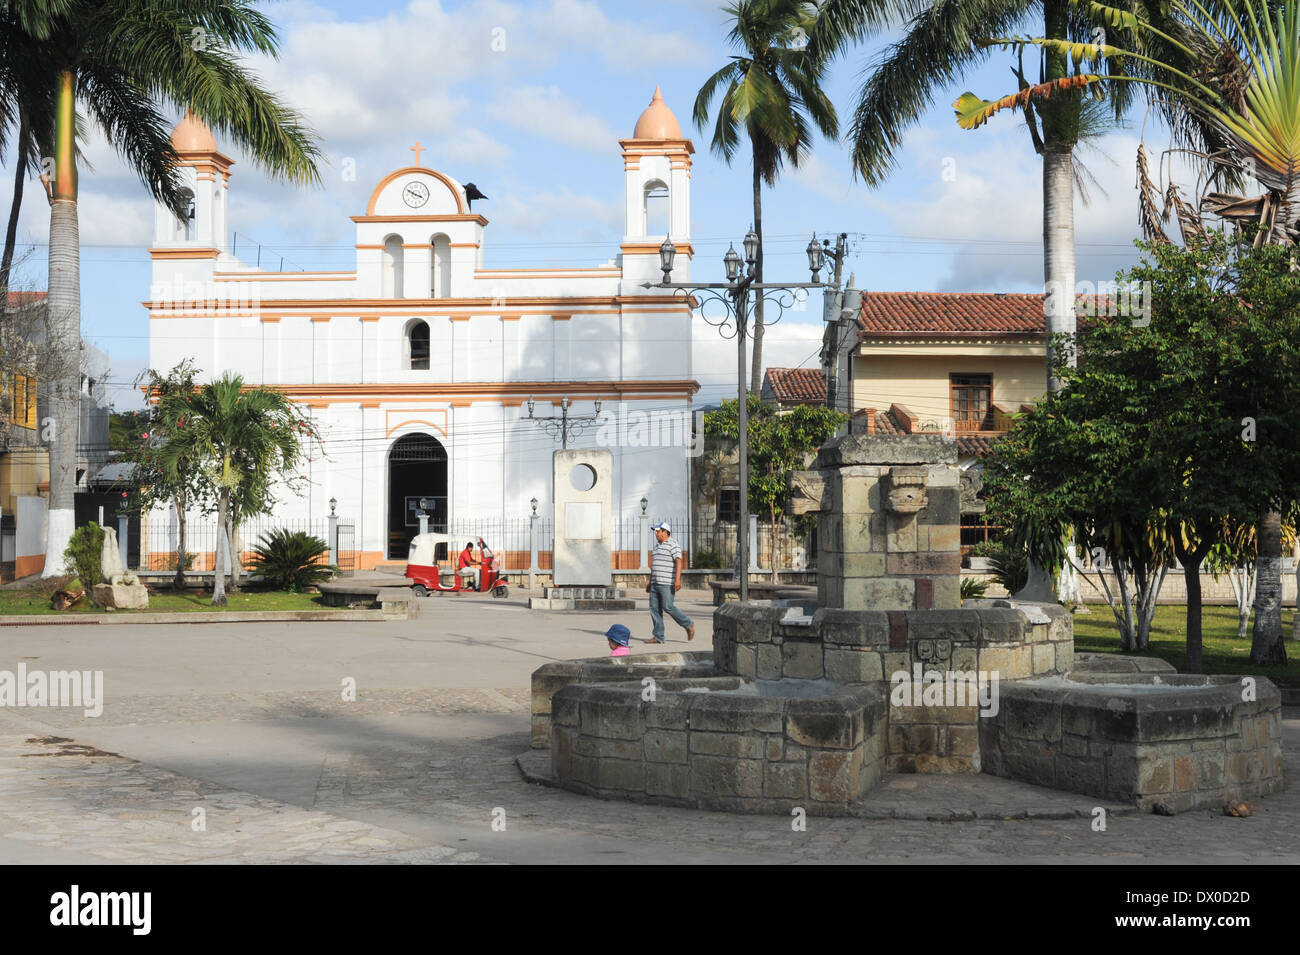 The colonial church of Copan ruinas on Houduras - Stock Image